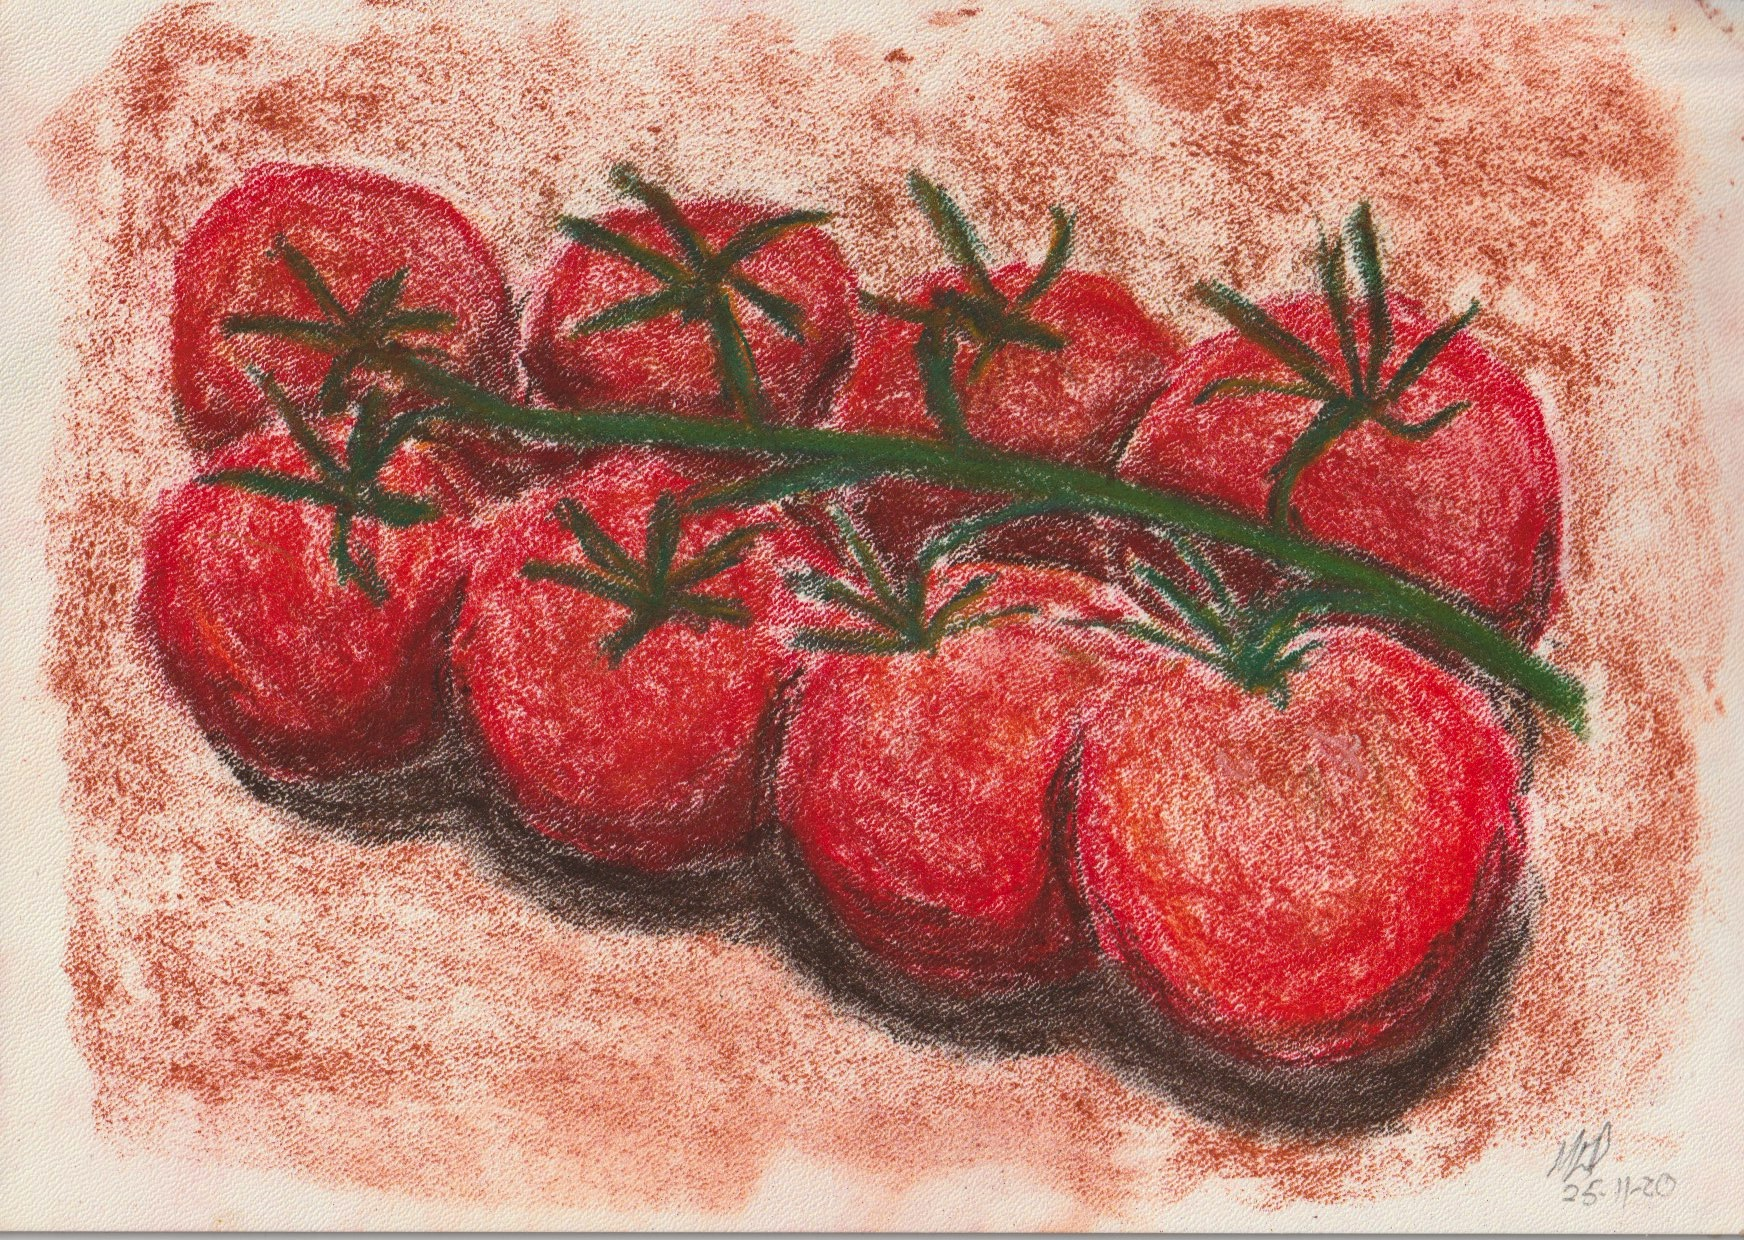 Tomatoes25Nov20